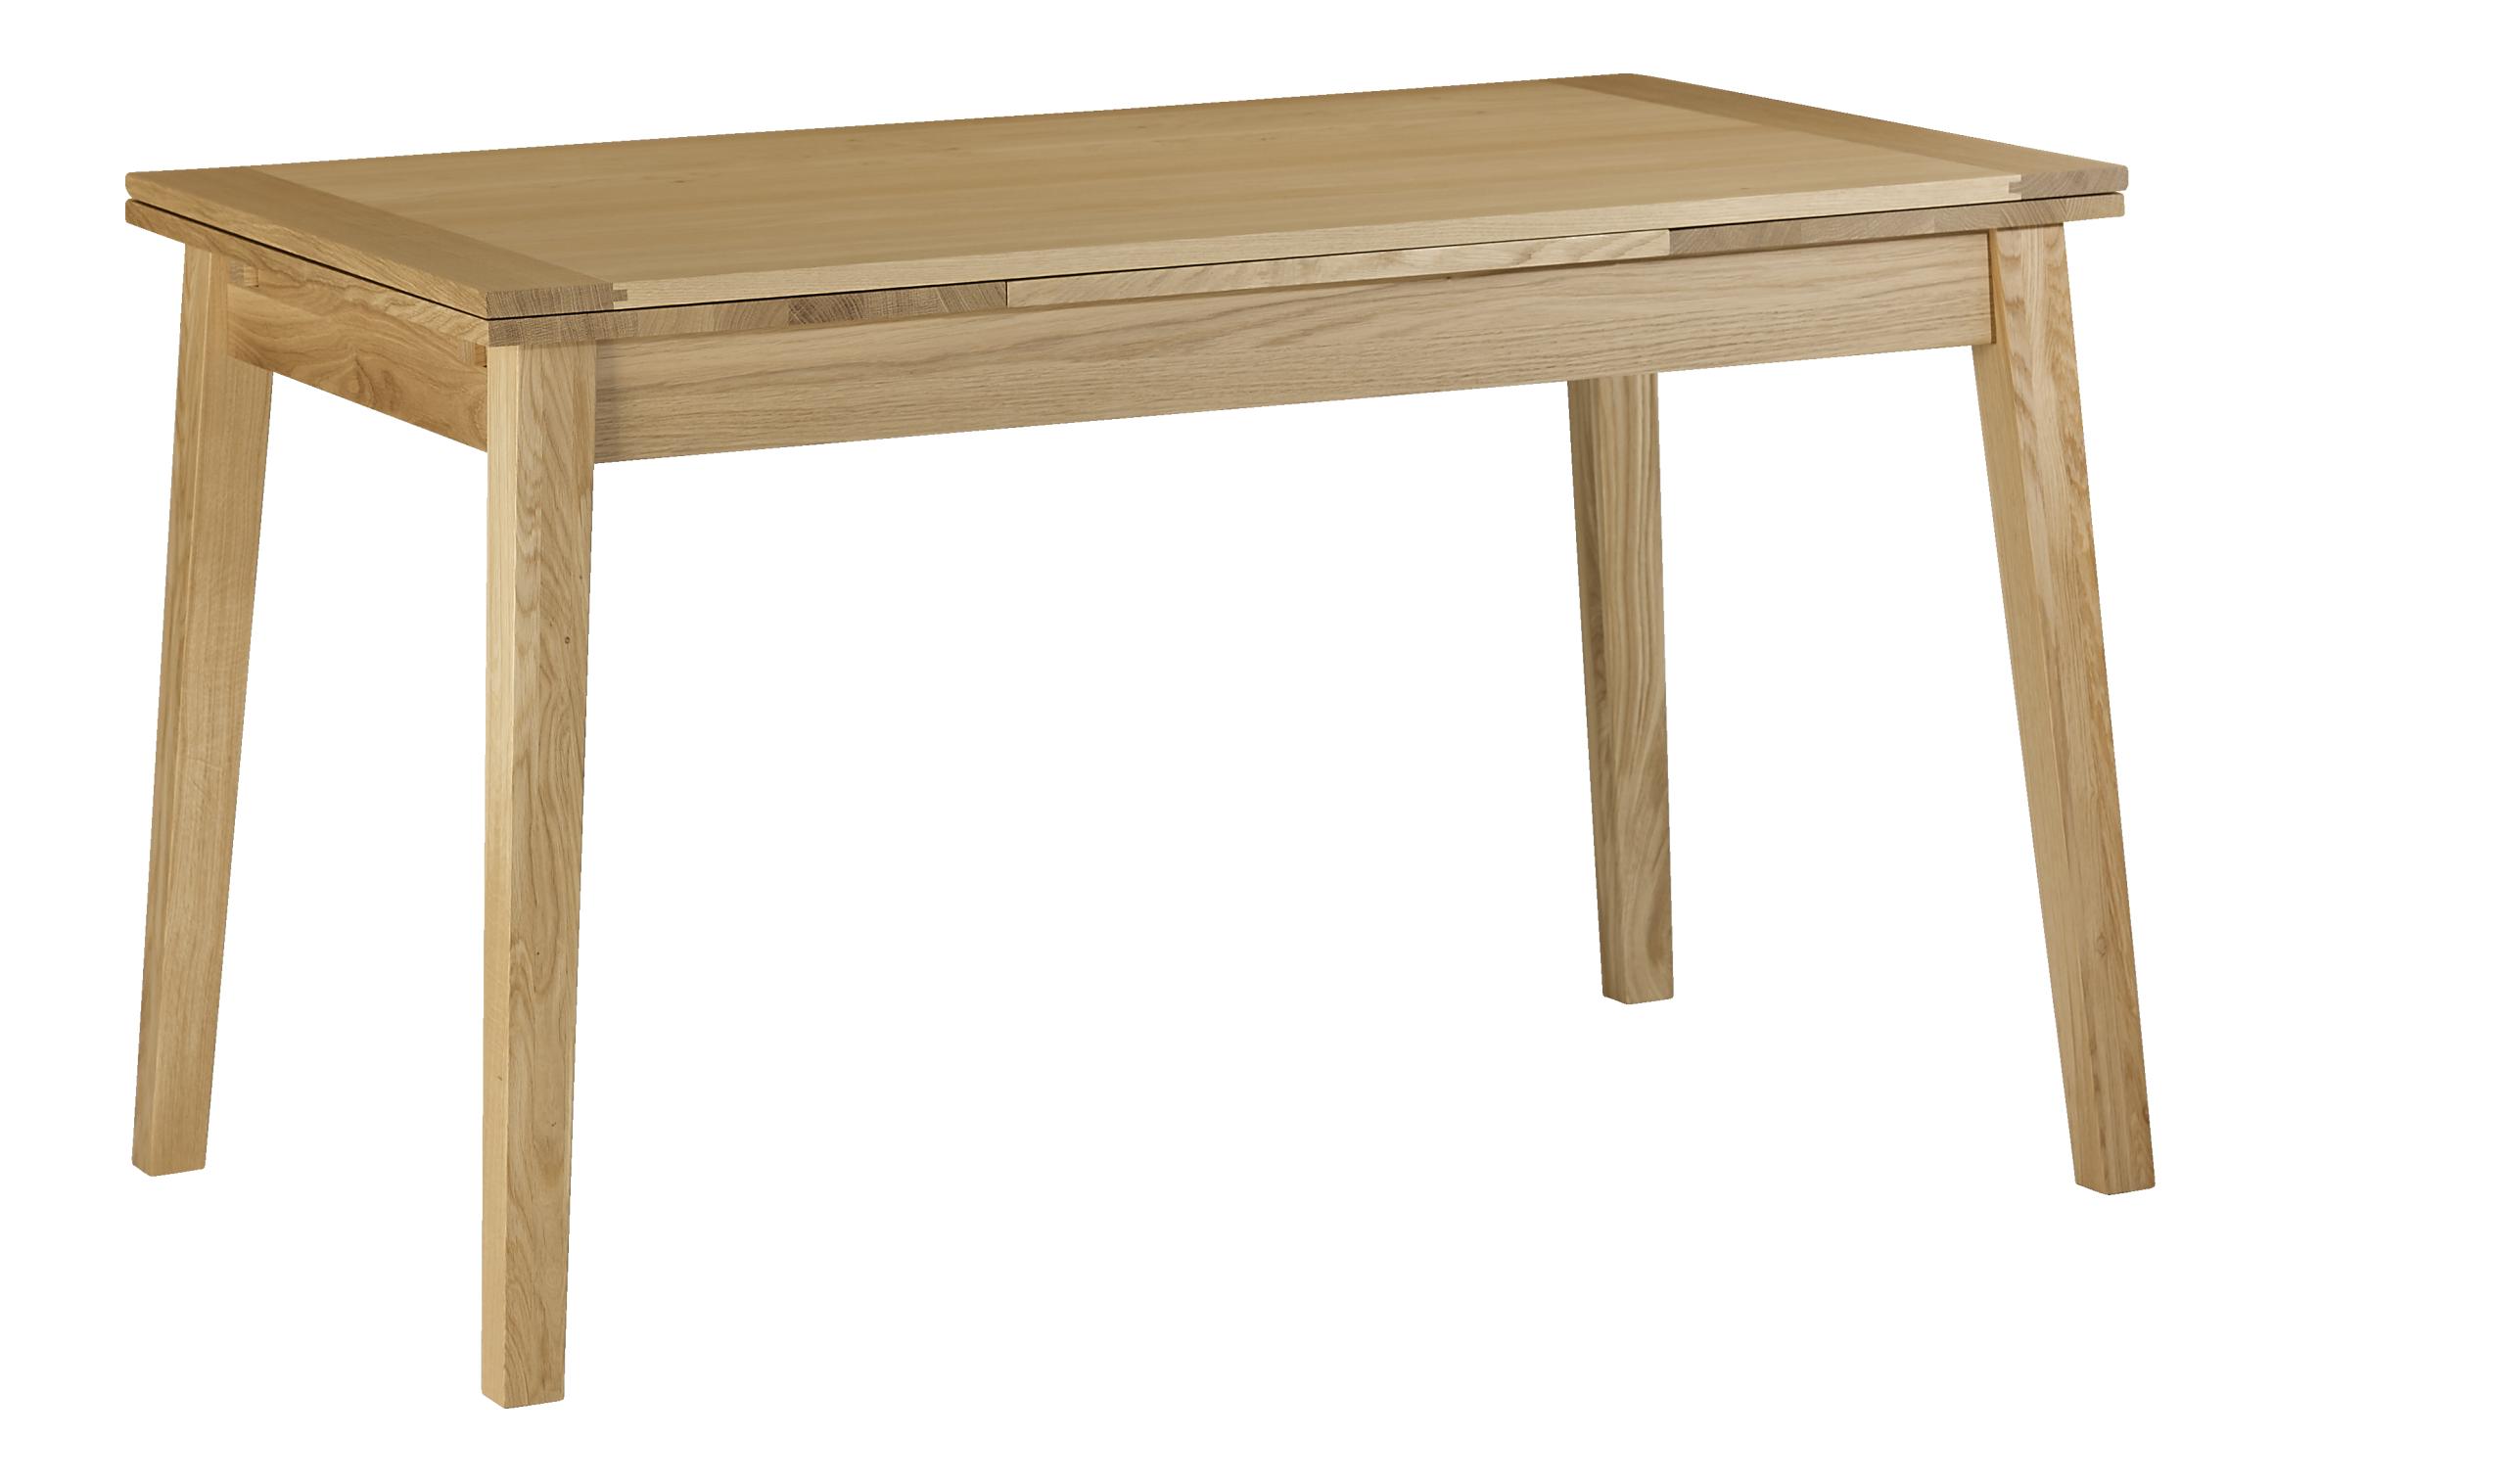 Ruskin tables de salle à manger naturel bois habitat home